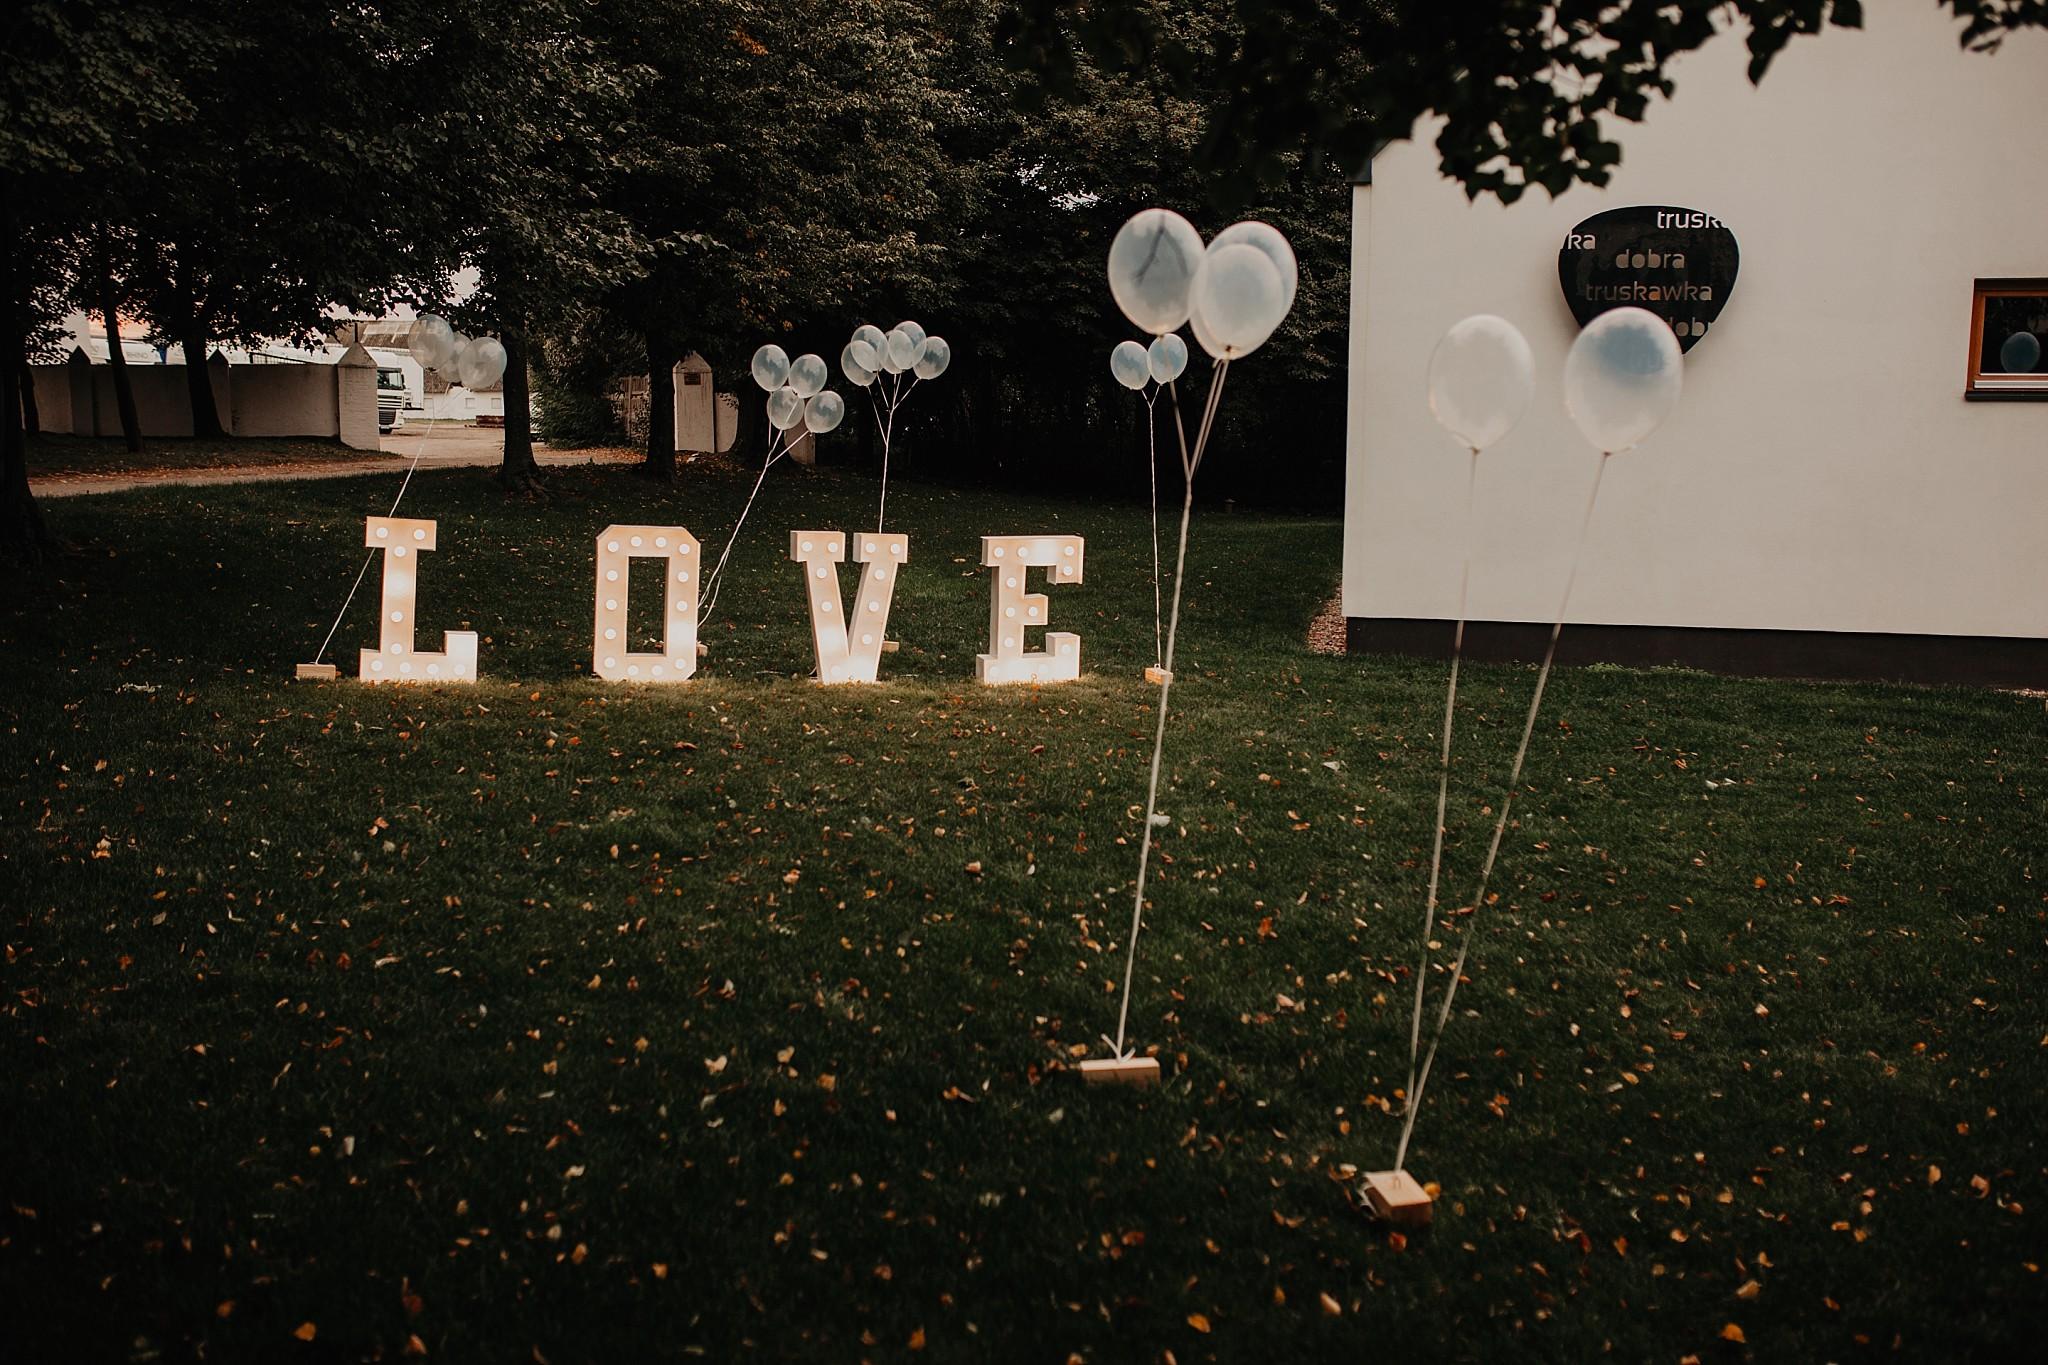 fotograf poznan wesele dobra truskawka piekne wesele pod poznaniem wesele w dobrej truskawce piekna para mloda slub marzen slub koronawirus slub listopad wesele koronawirus 246